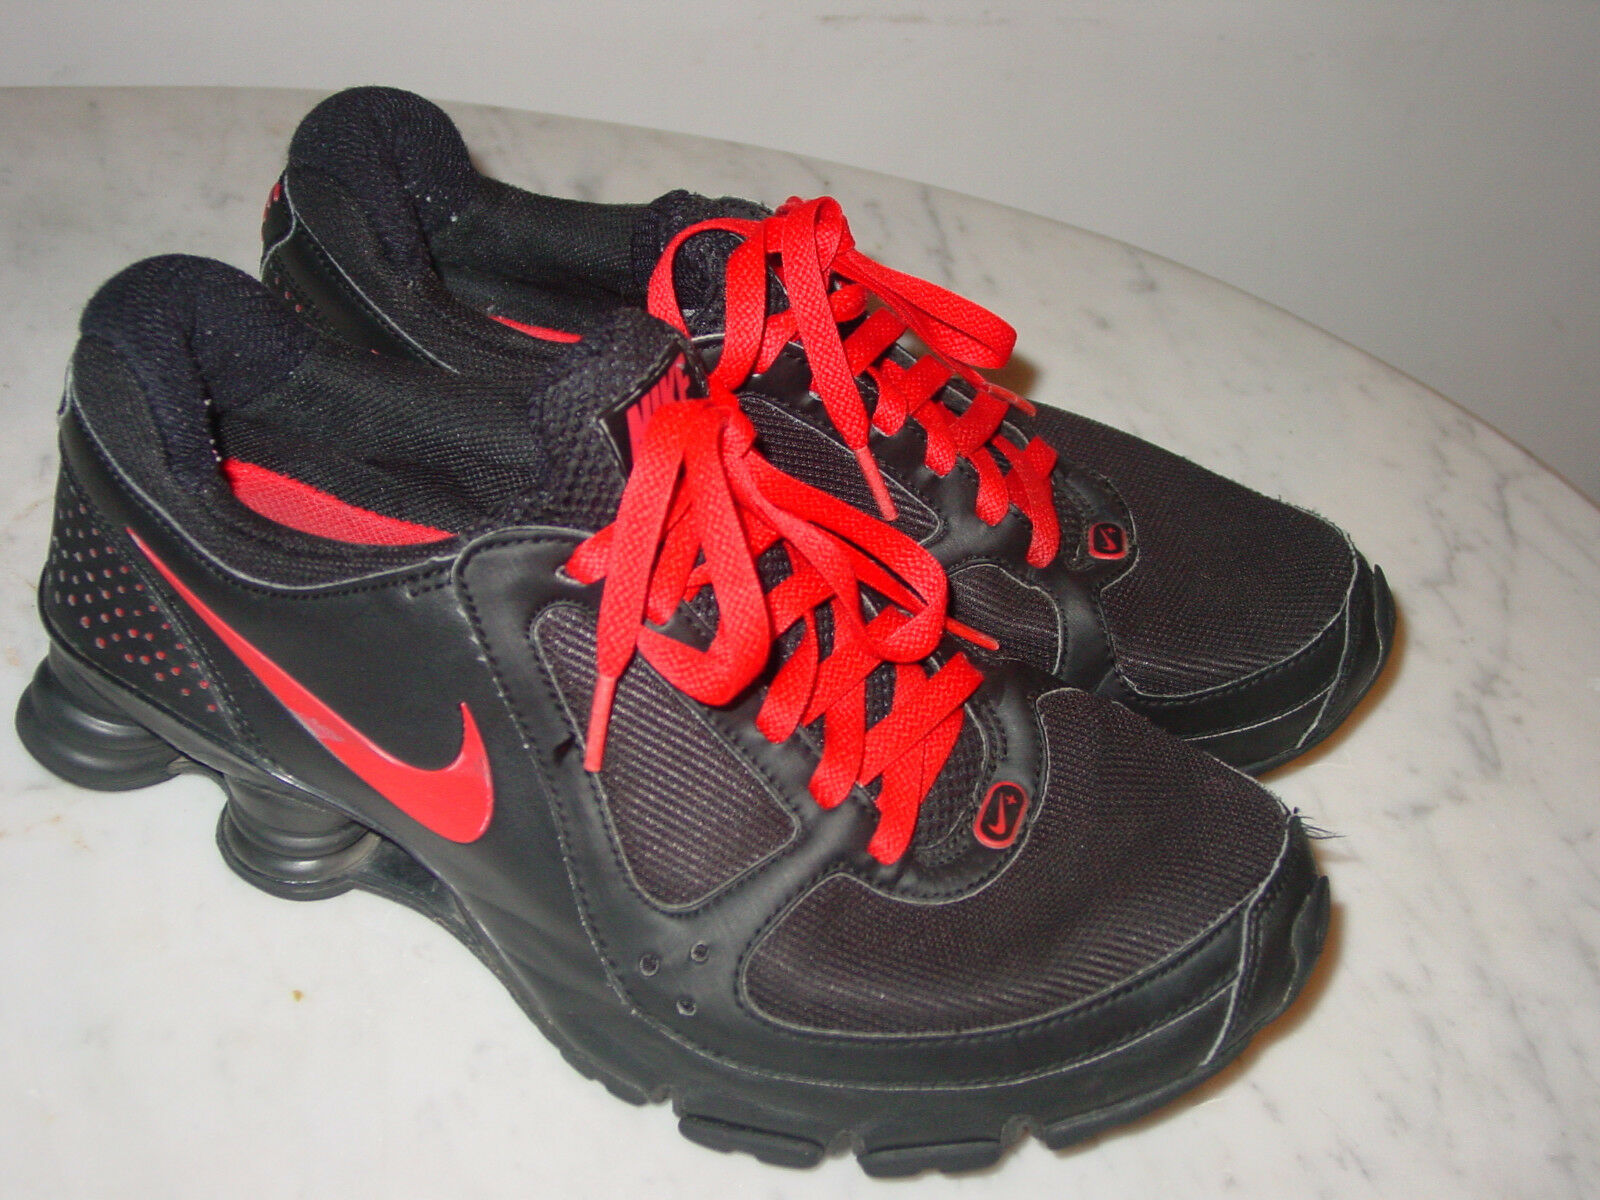 2009 Mens Nike Shox Turbo+ 10 Black Red Running shoes  Size 9  160.00